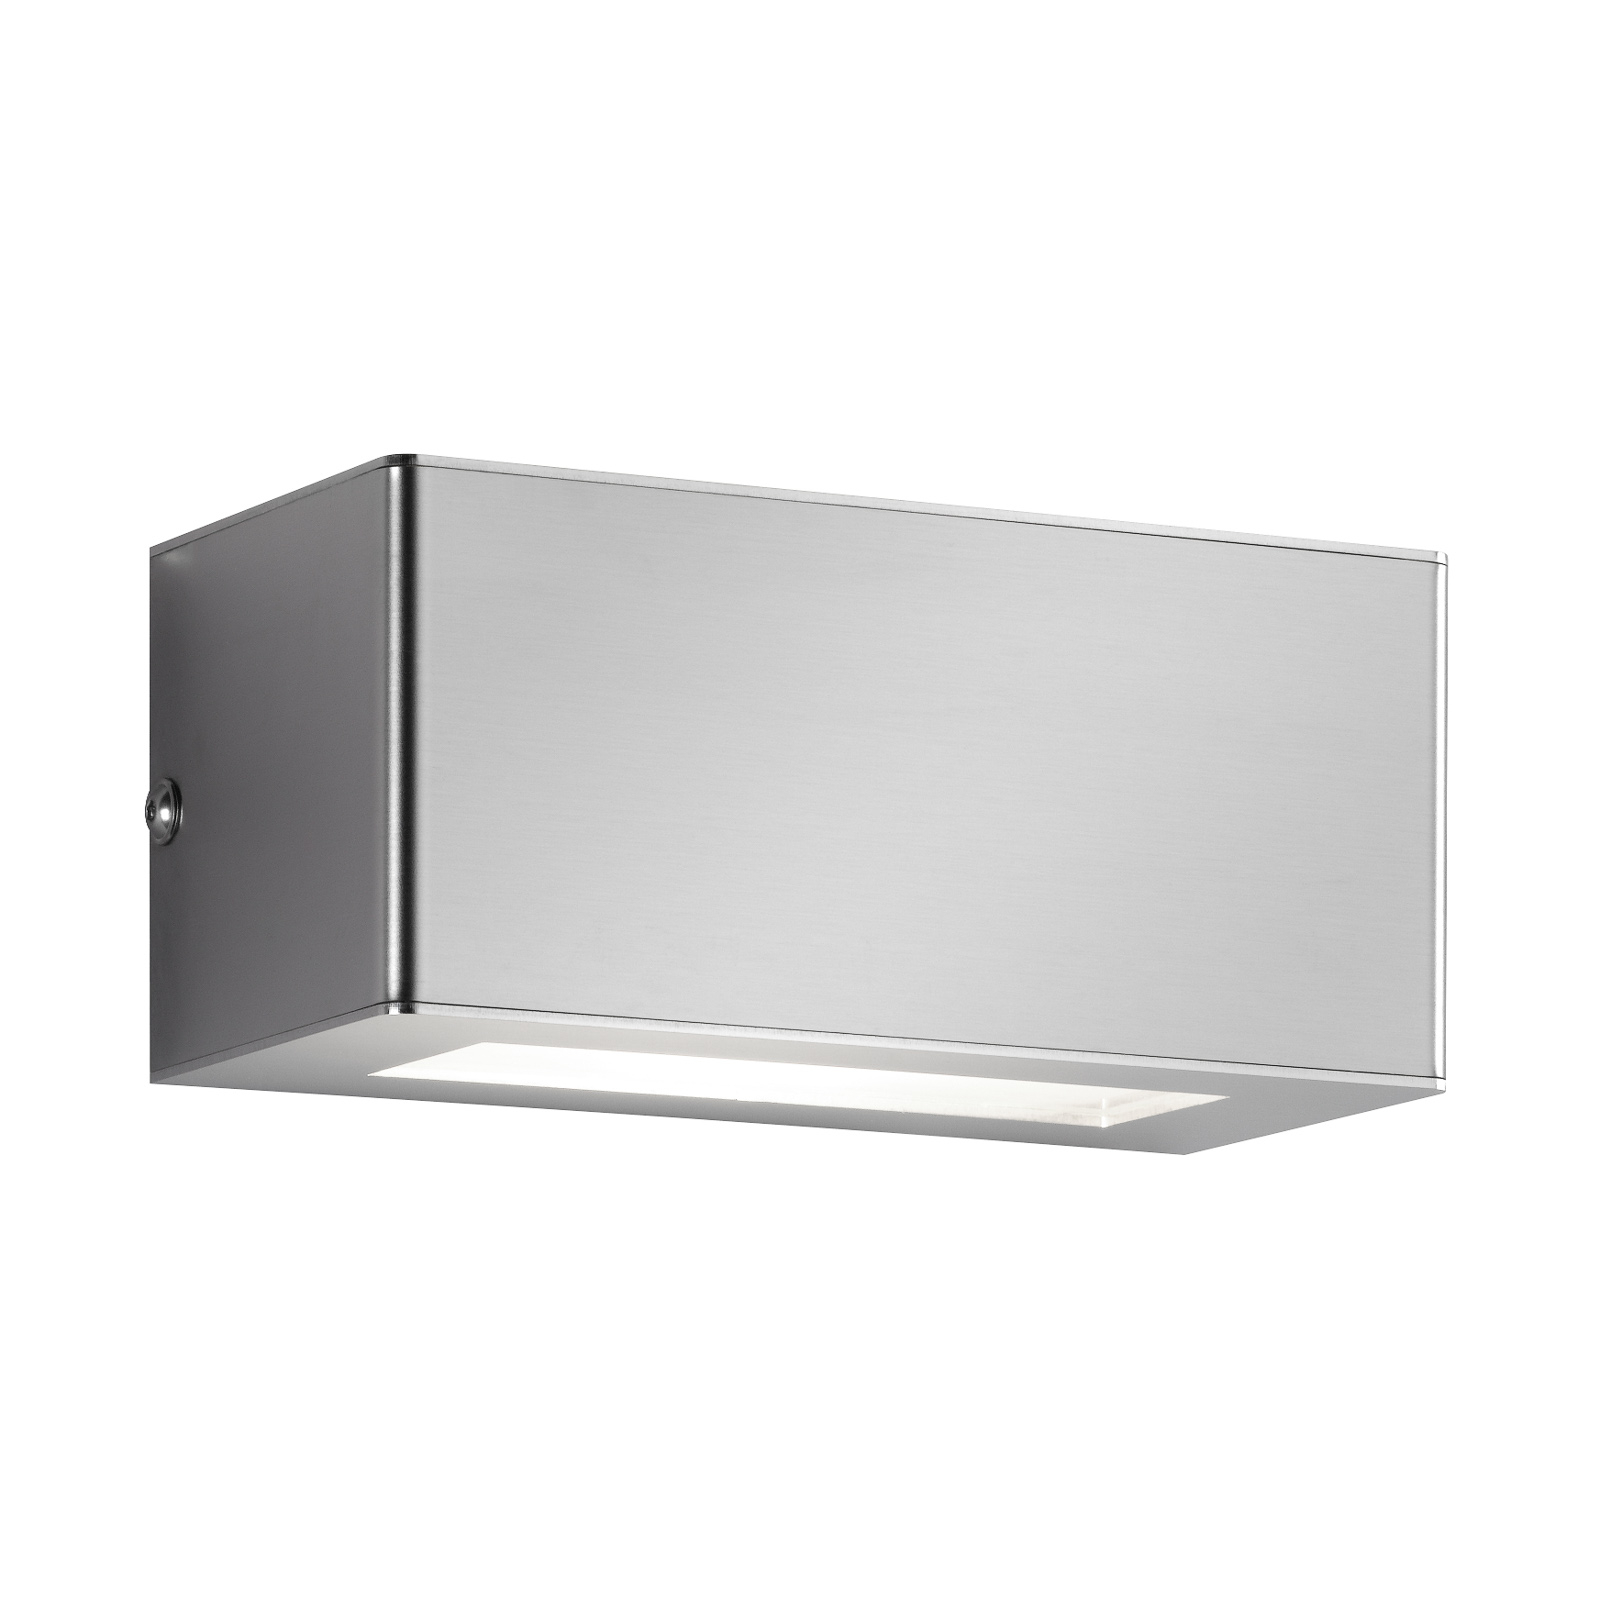 Aqua Stone 2-bulb LED outdoor wall light_2011223_1